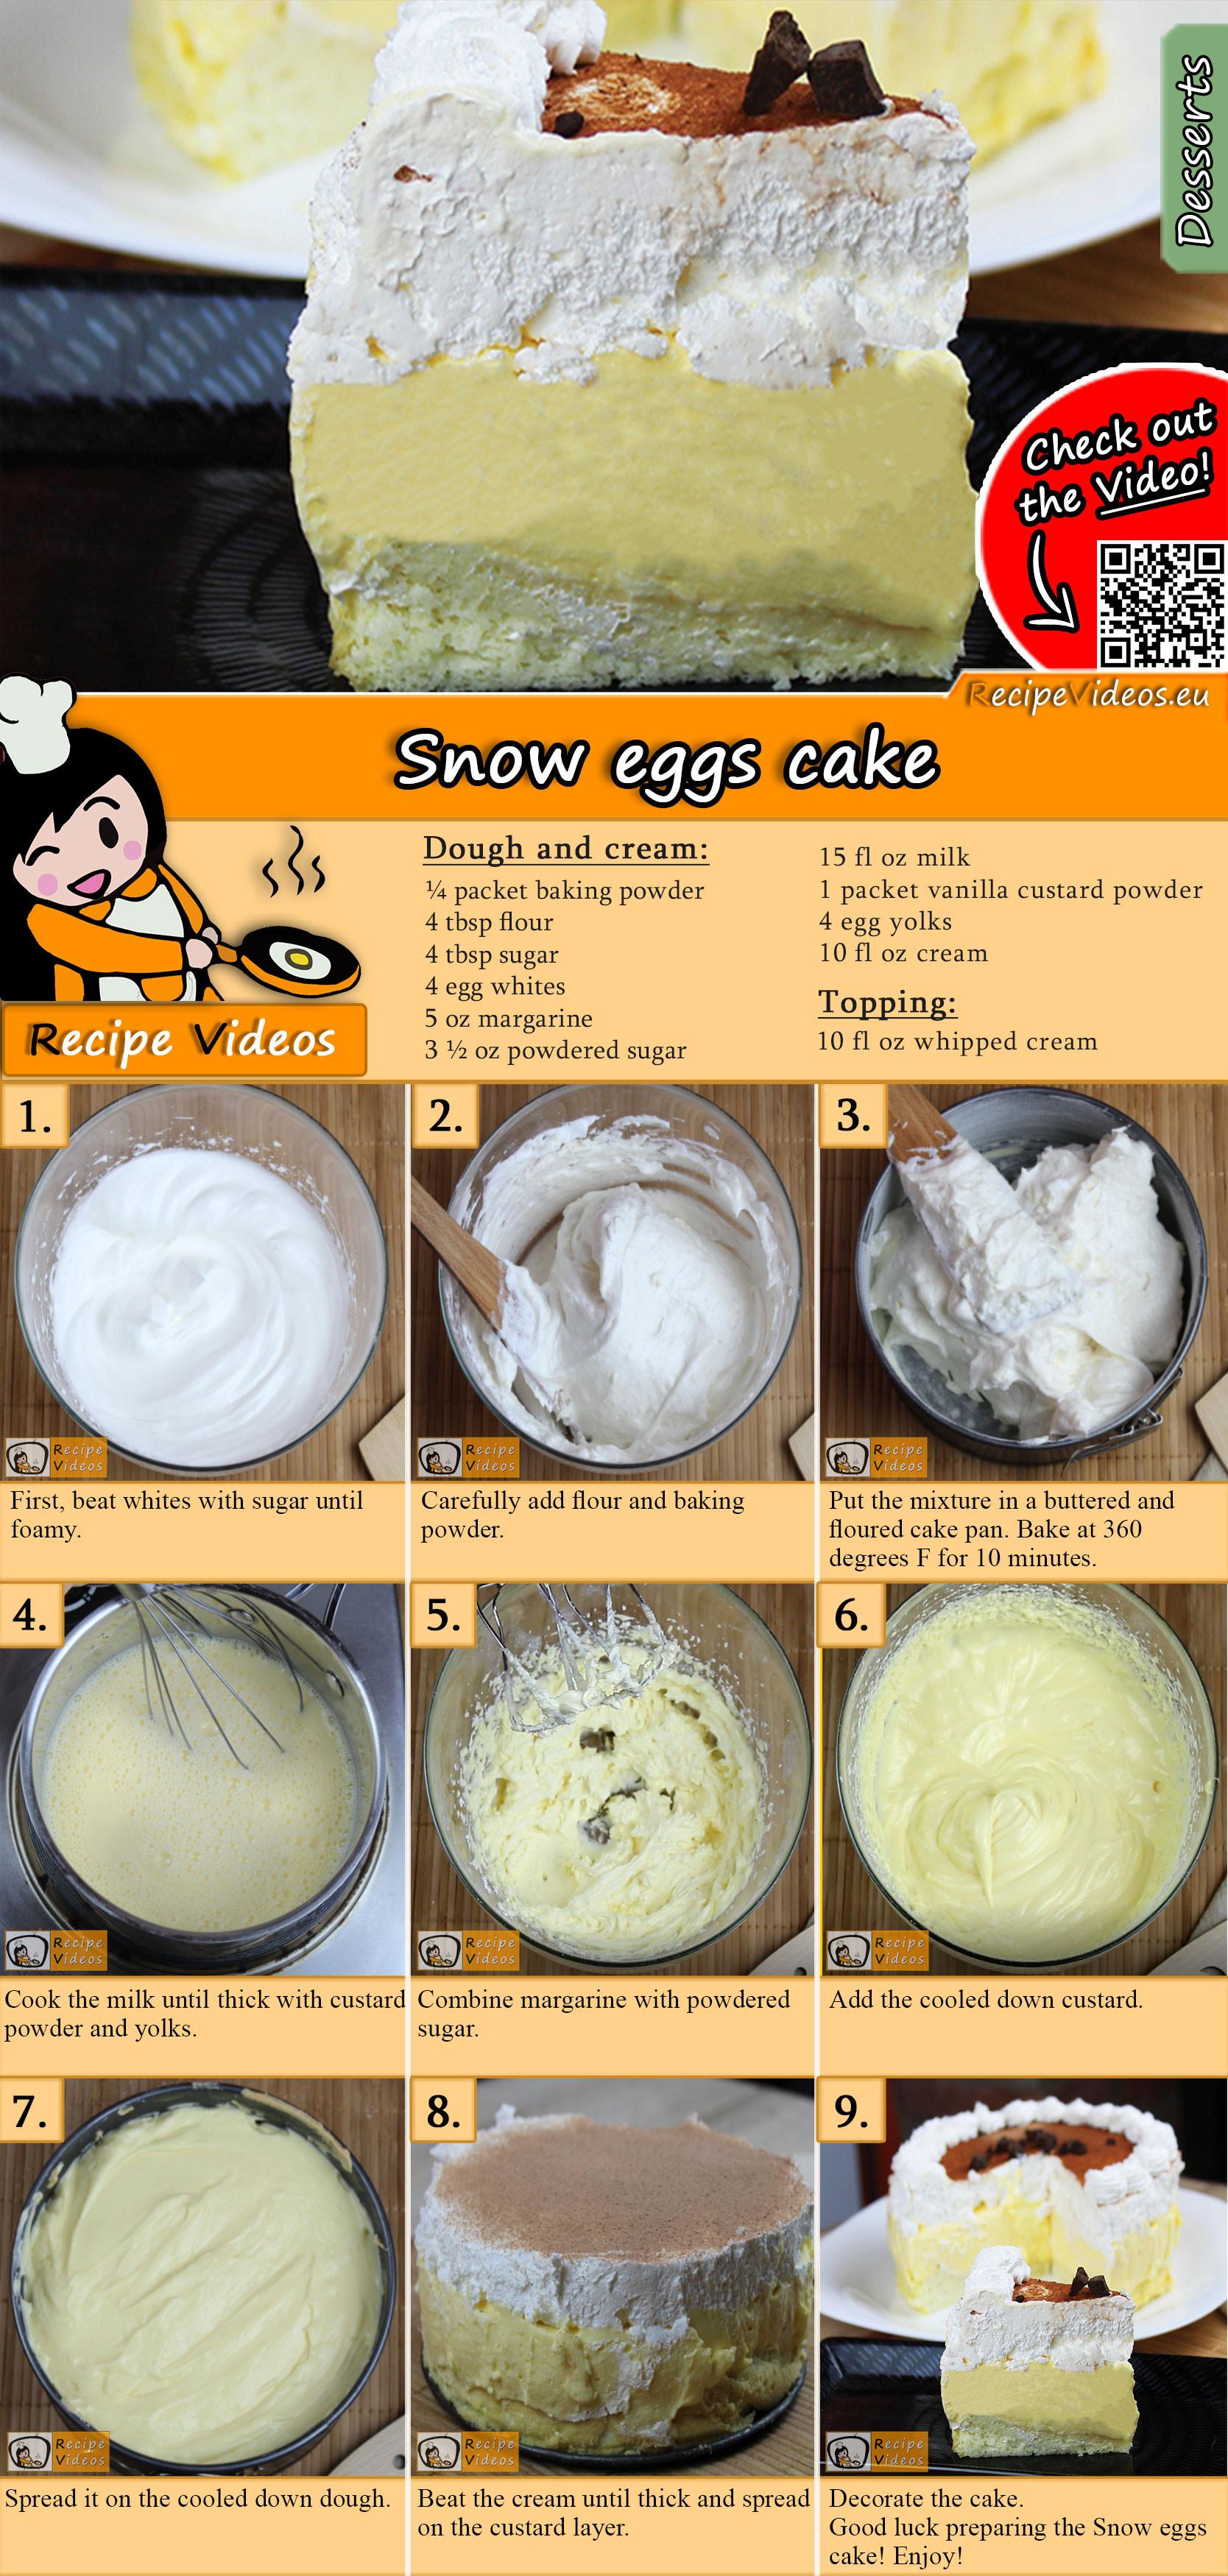 Snow eggs cake recipe with video